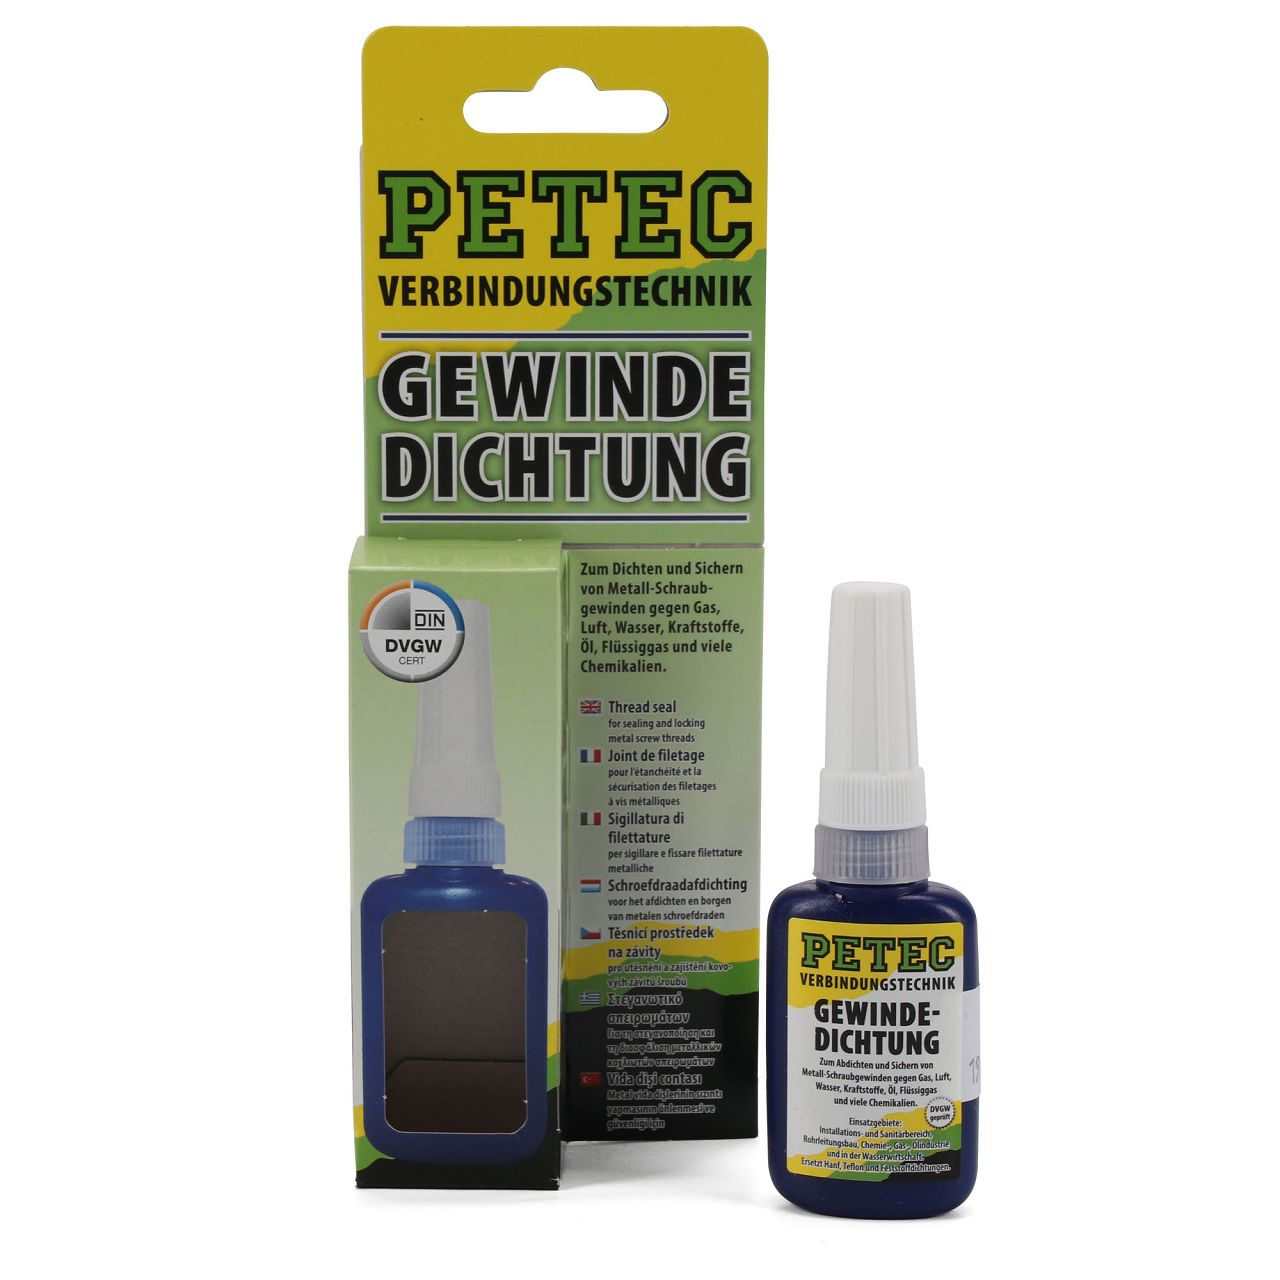 PETEC 97216 Gewindedichtung Gewindedichtstoff Dichtung Dichtmaterial 15g